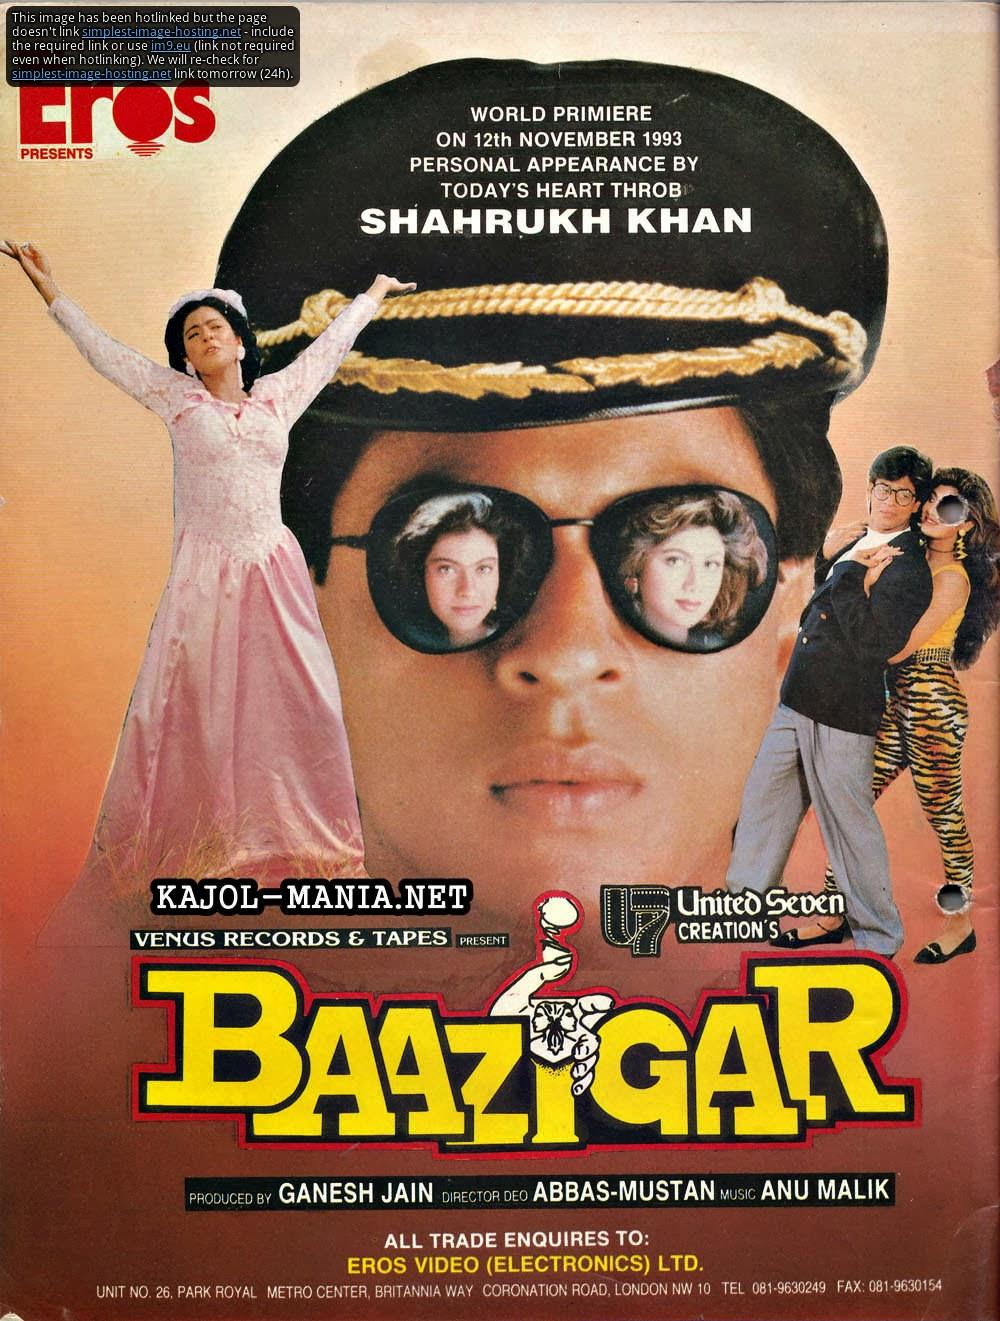 bazigar movie songs download : dvd beaver kwaidan